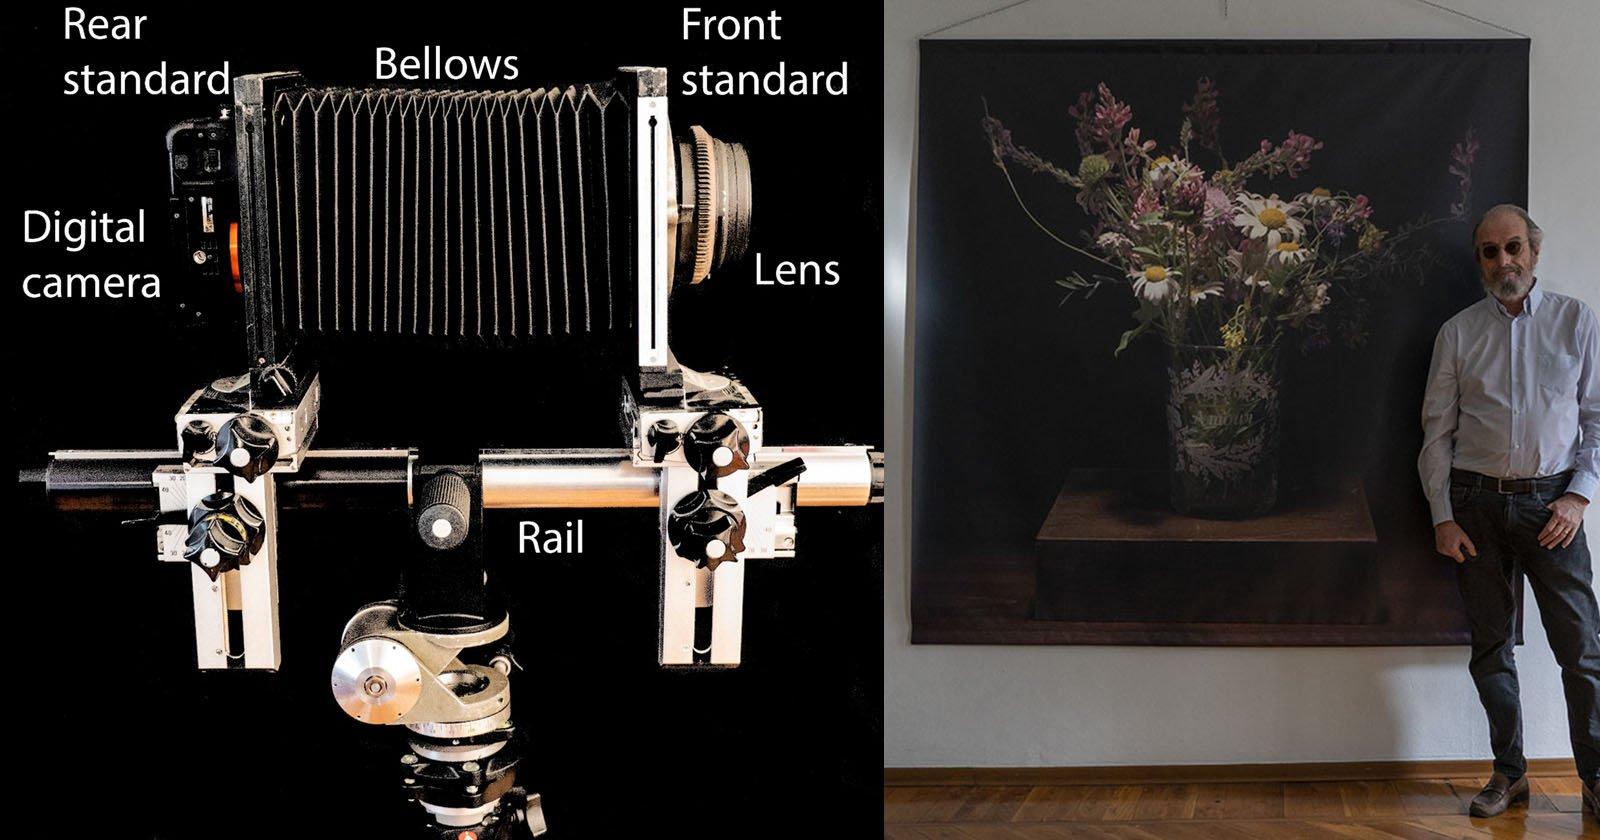 DIY Ultra-High-Res Digital Photos with a Large Format Camera